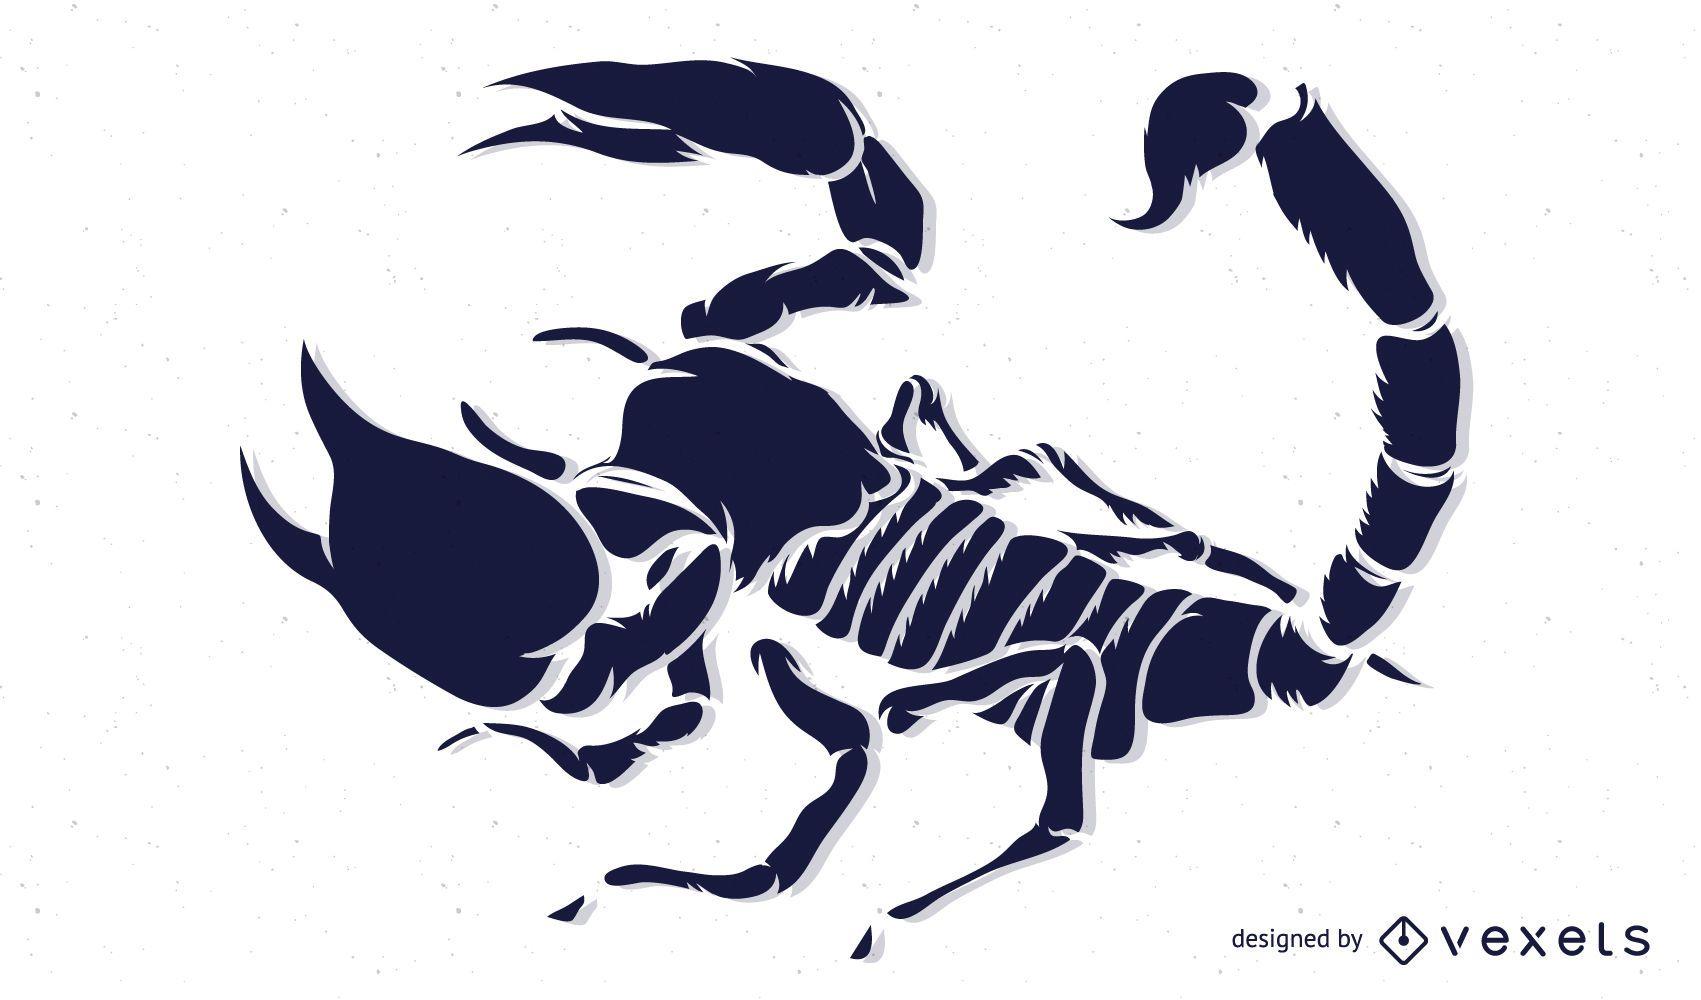 Scorpion Detailed Silhouette Design